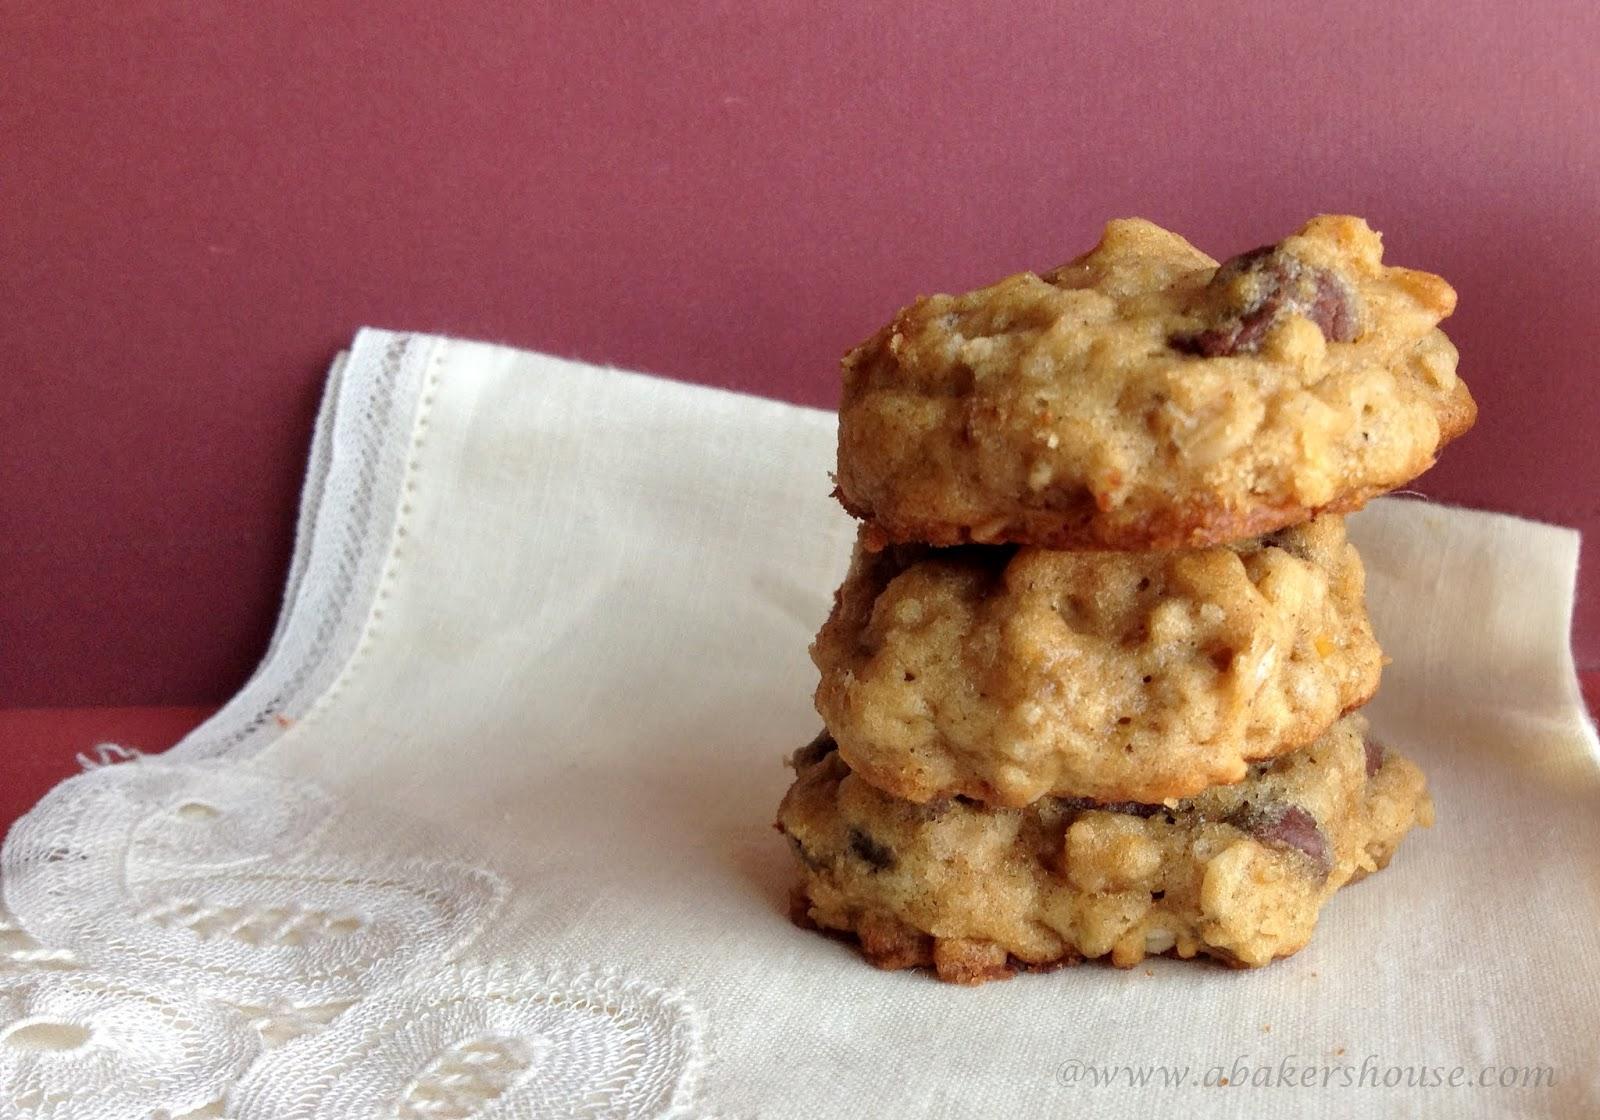 Soft banana oatmeal chocolate chip cookies